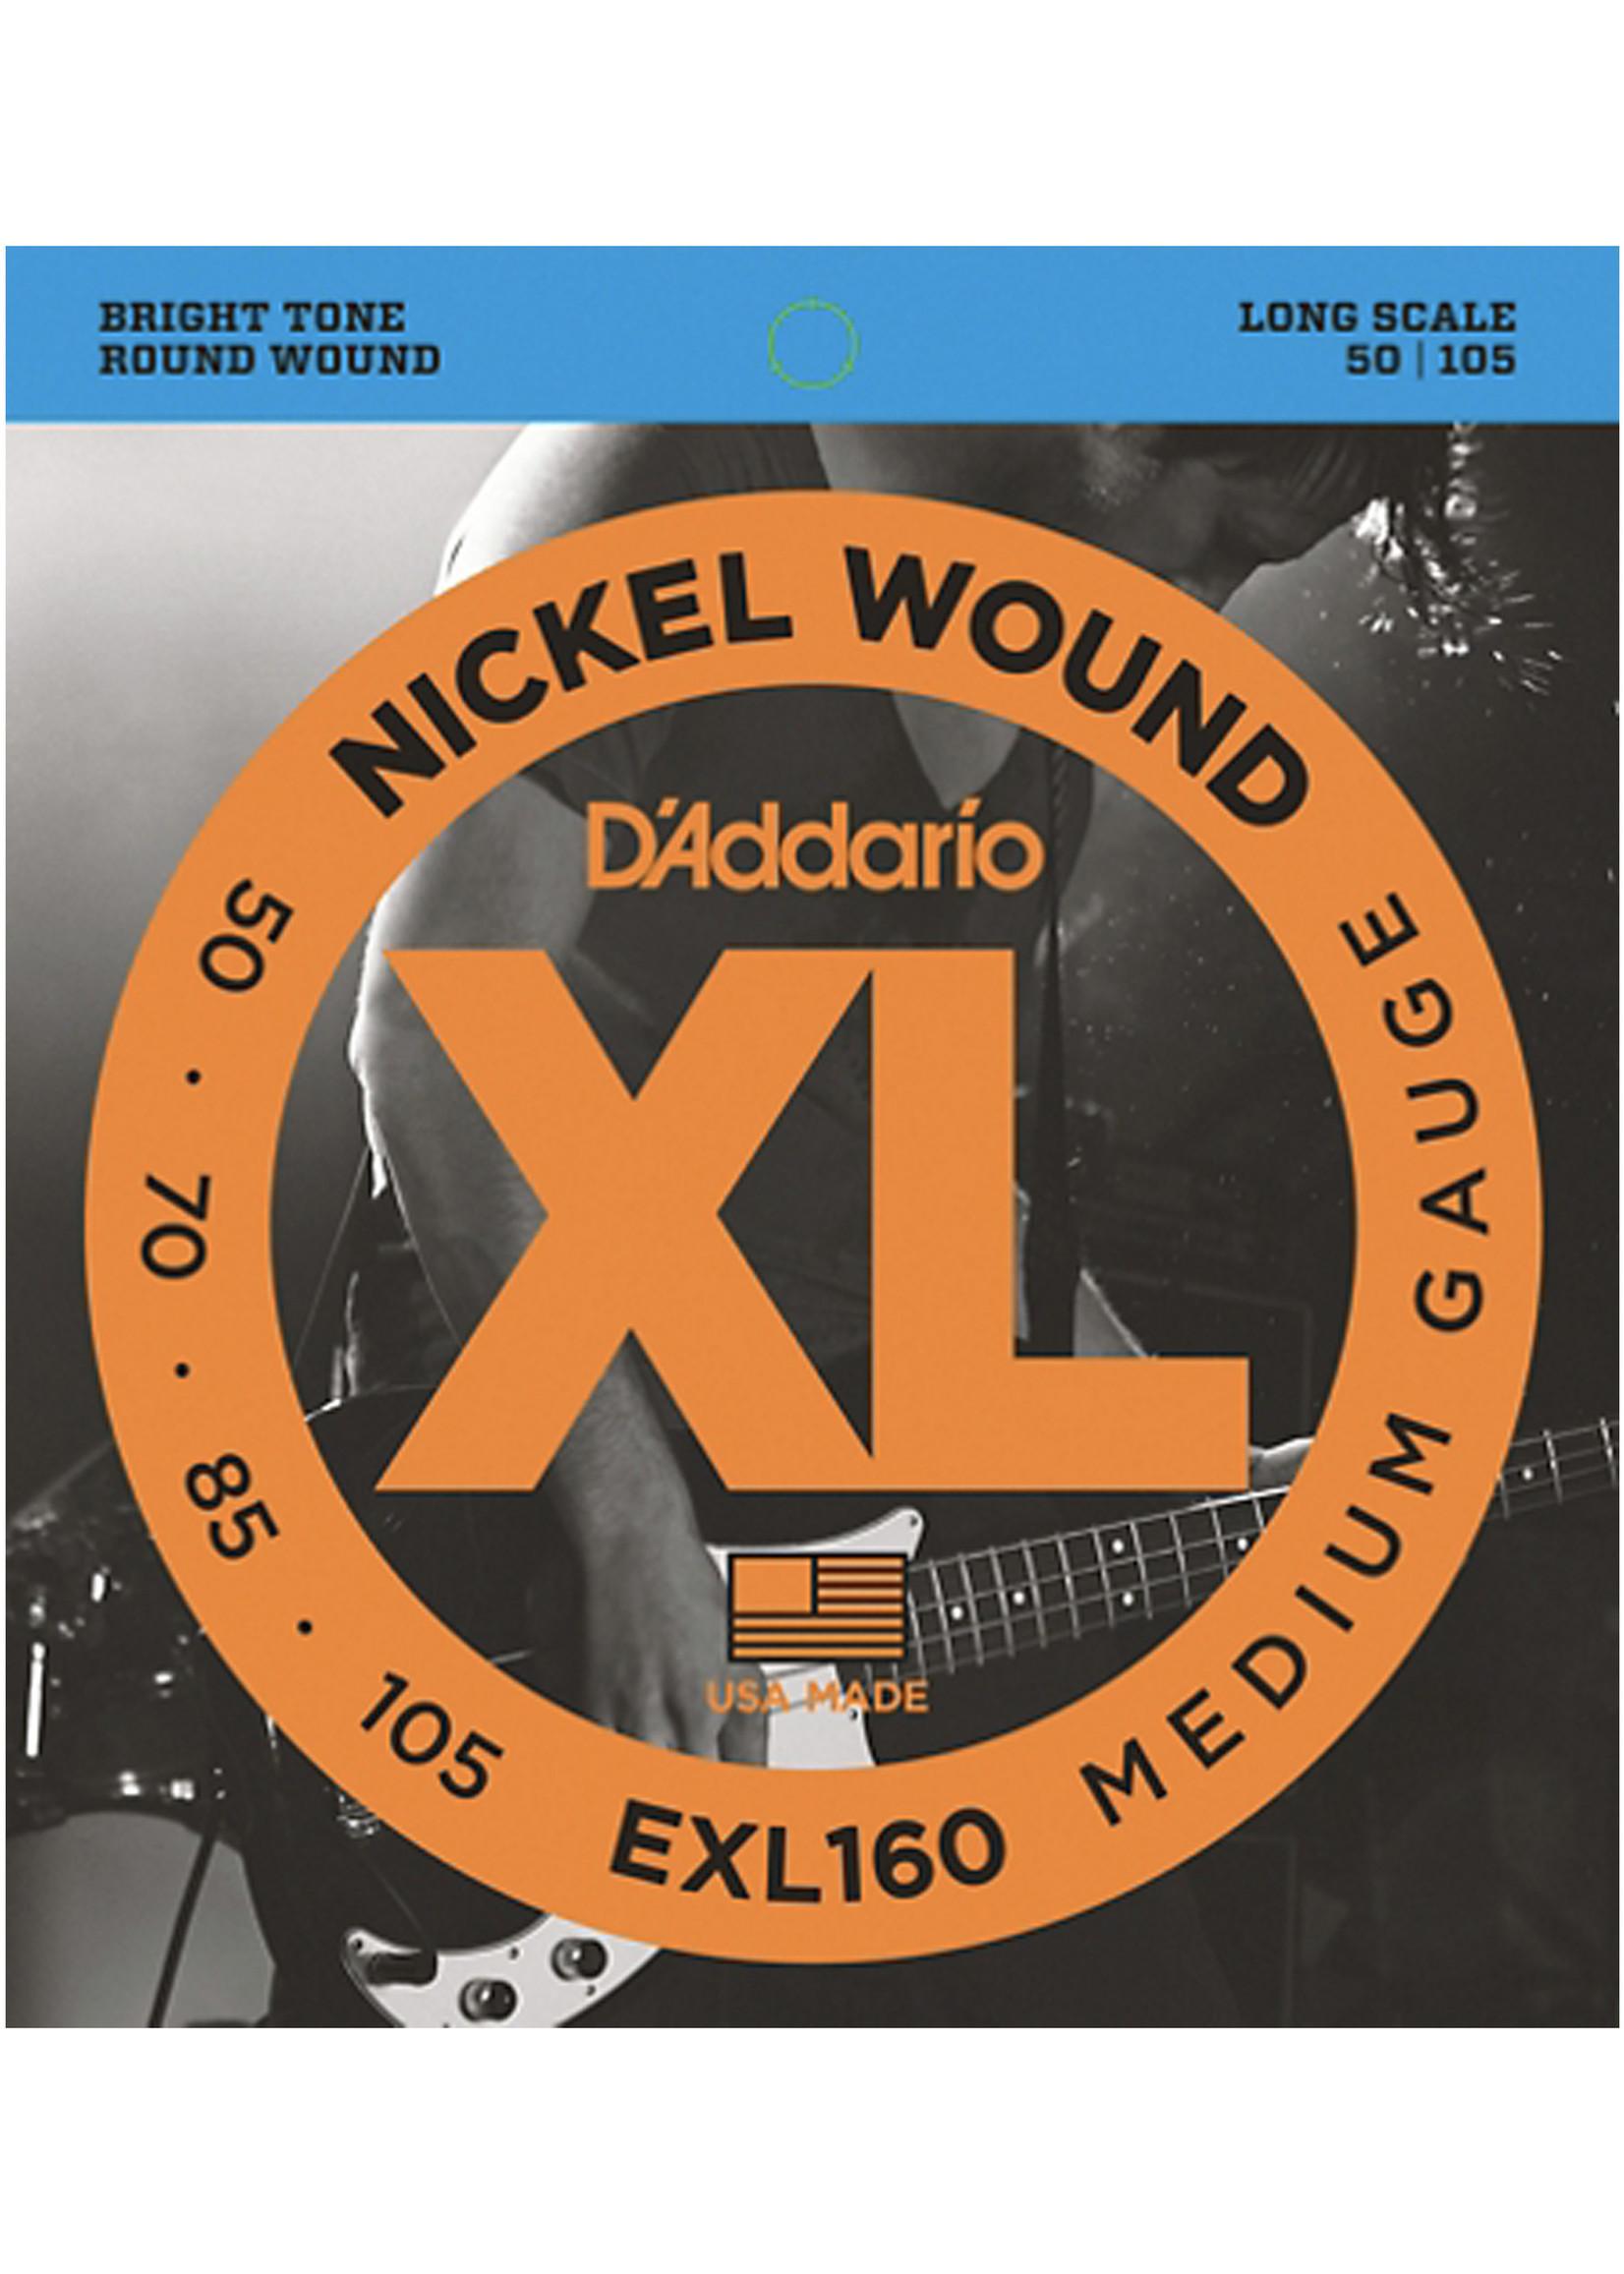 DAddario Fretted D'Addario EXL160, Medium 50-105